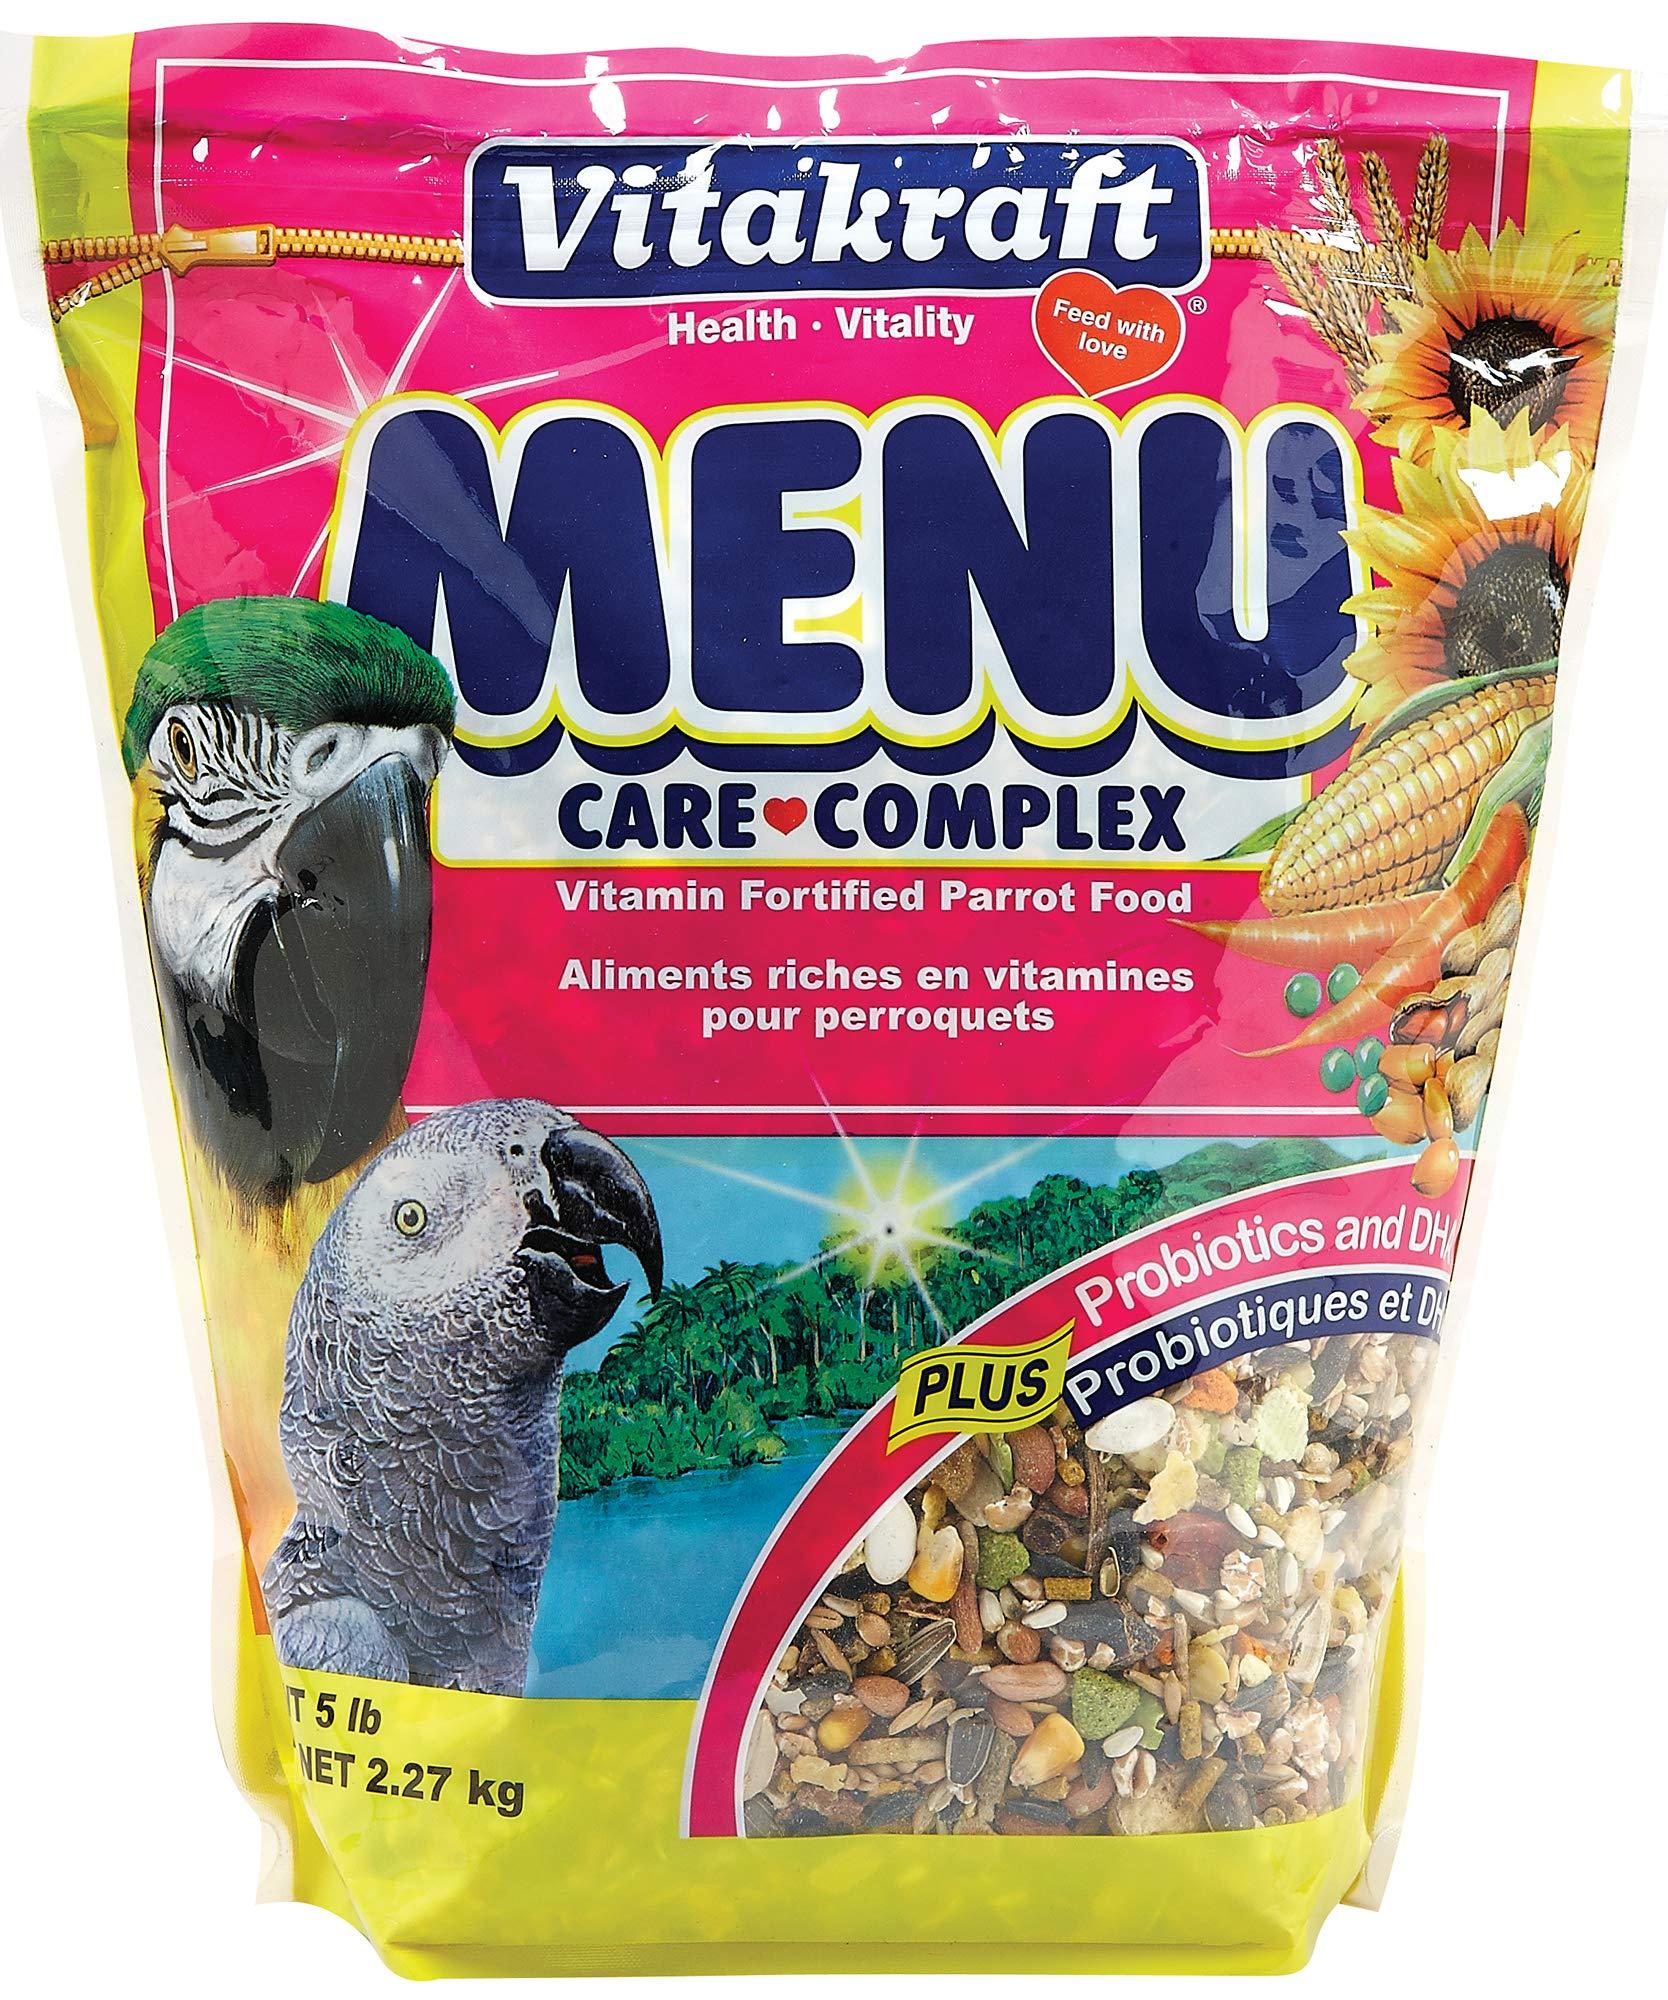 Vitakraft Menu Vitamin Fortified Parrot Food, 5 Lb. by Vitakraft